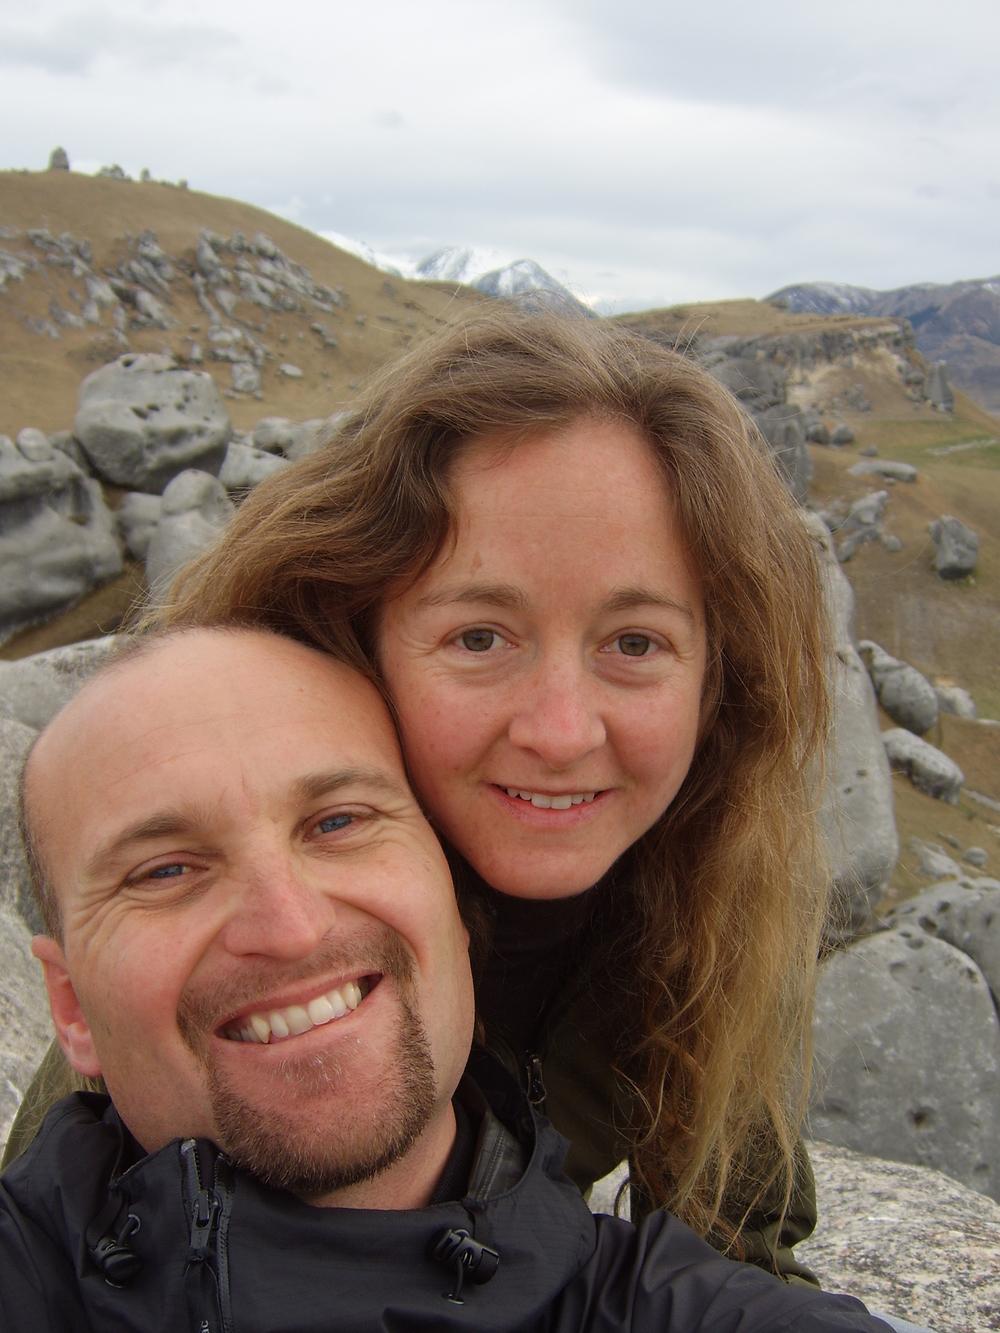 Paul and Heidi Wrigley